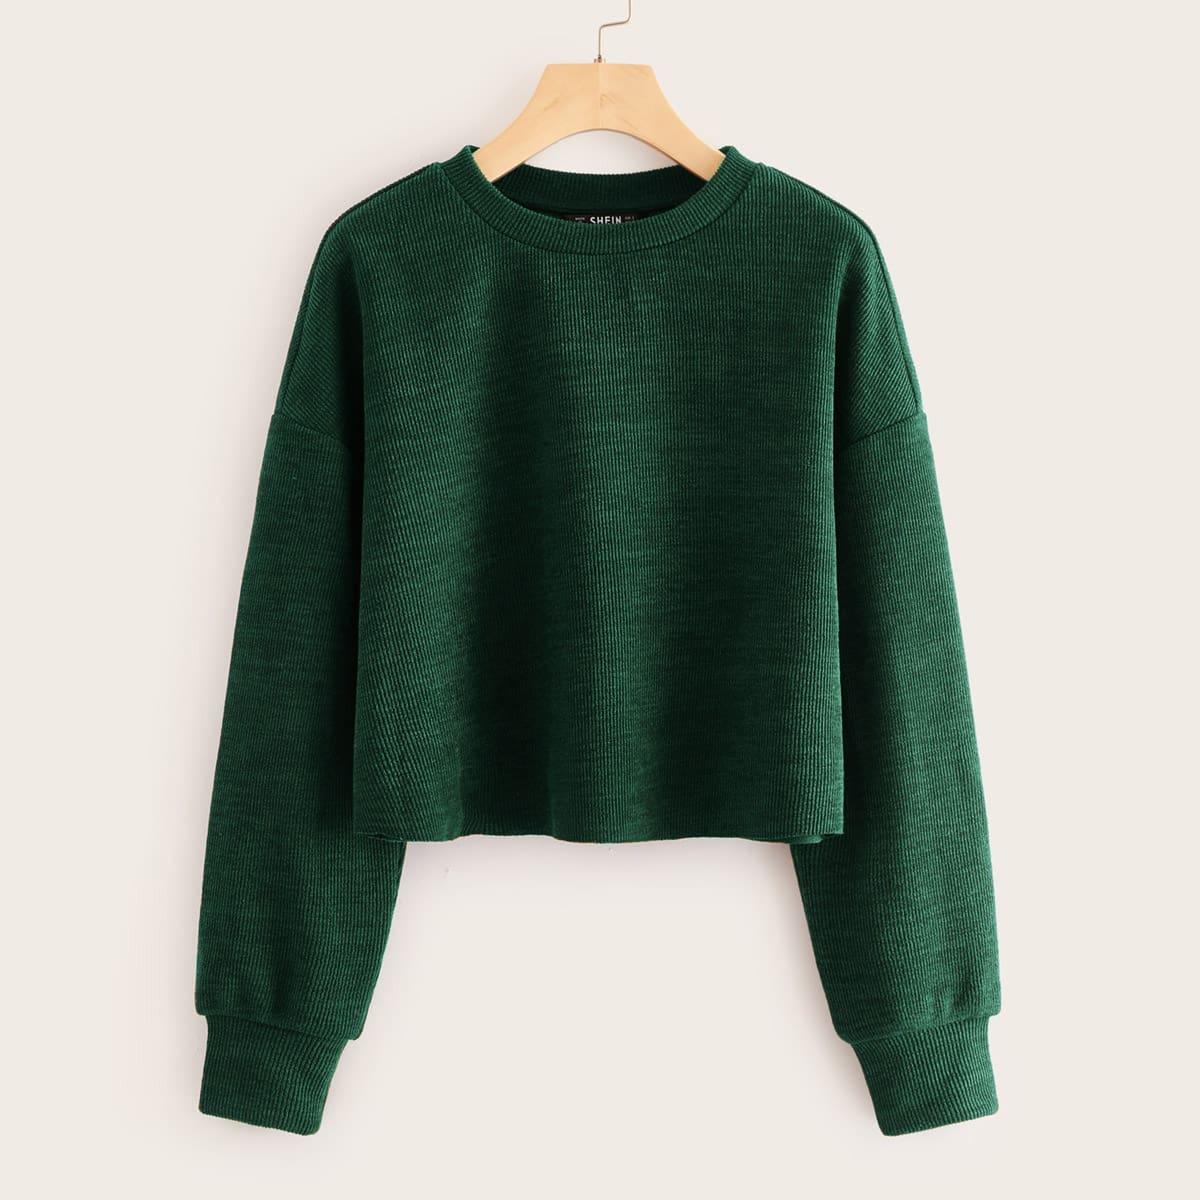 Groen Casual Vlak Sweatshirts Geplisseerde